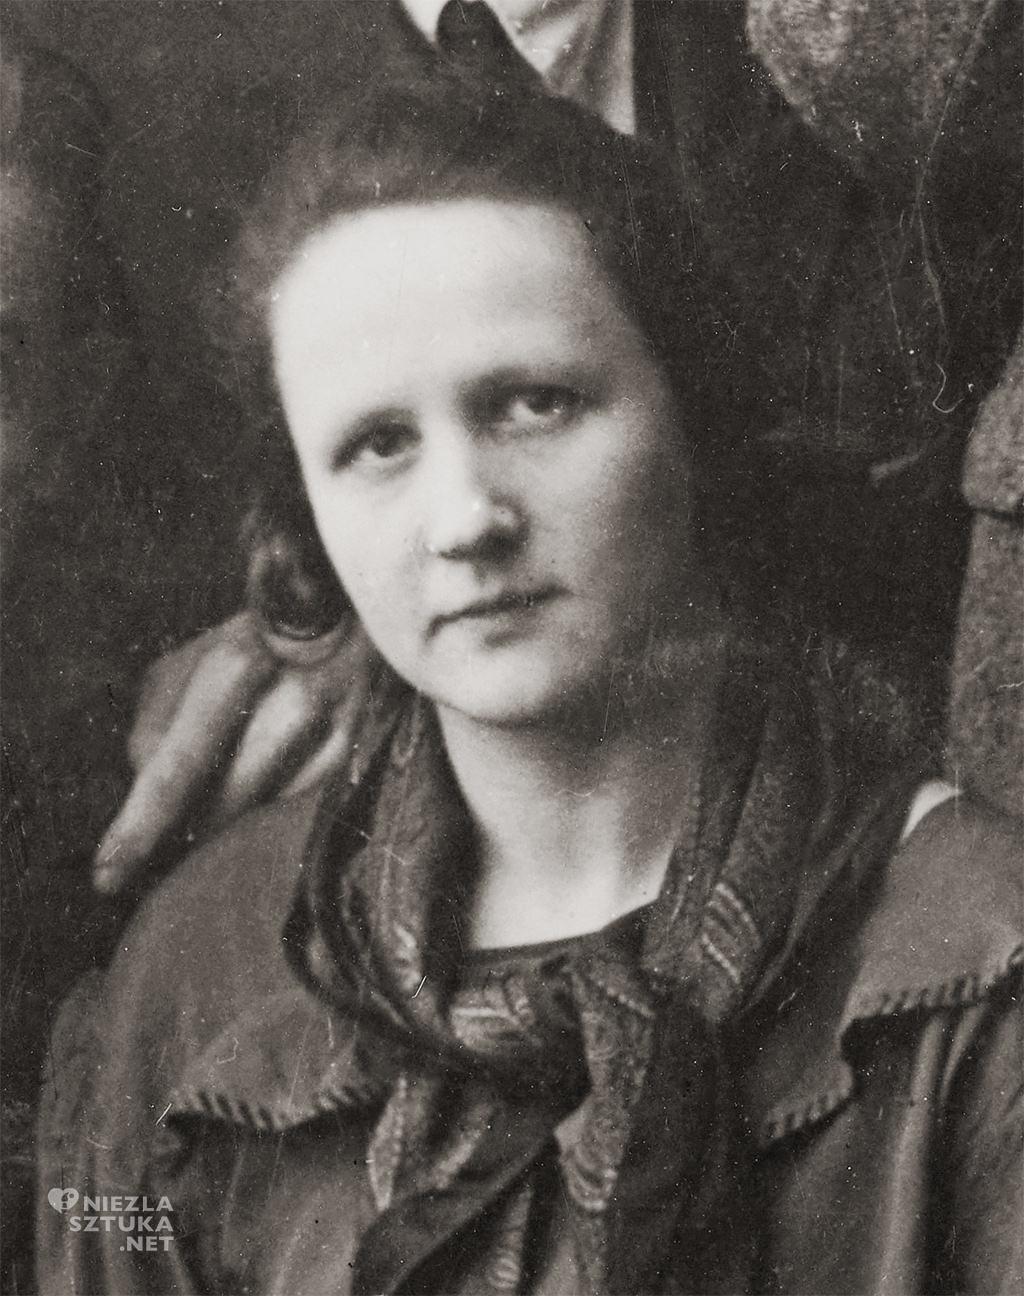 Hanna Rudzka-Cybis, malarka, Niezła sztuka